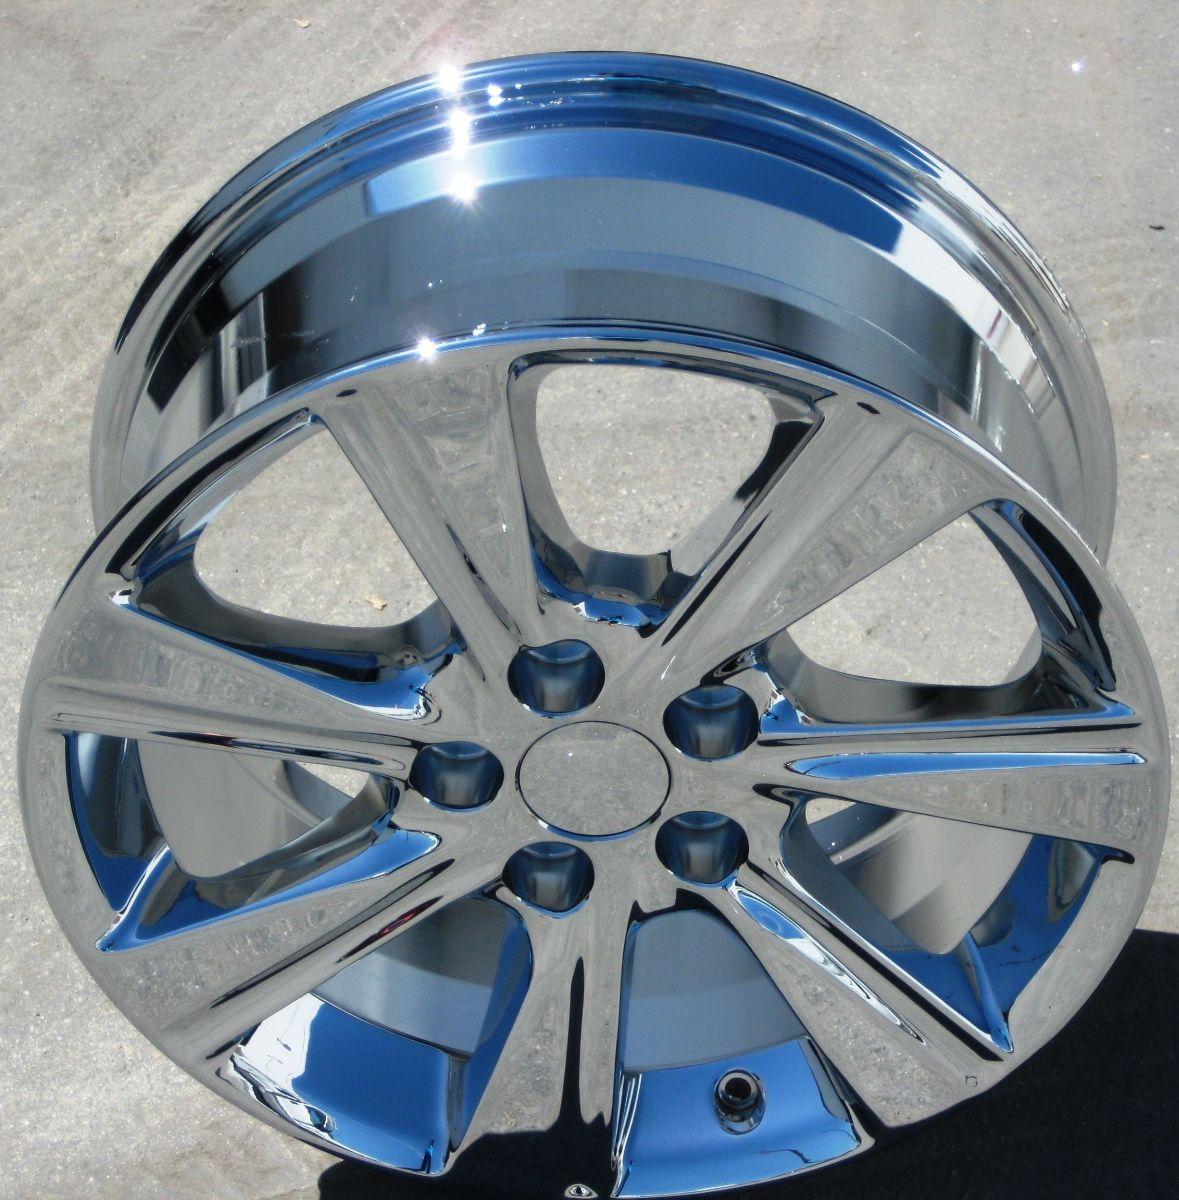 FACTORY TOYOTA HIGHLANDER CHROME WHEELS RIMS RX350 VENZA RX330 69580